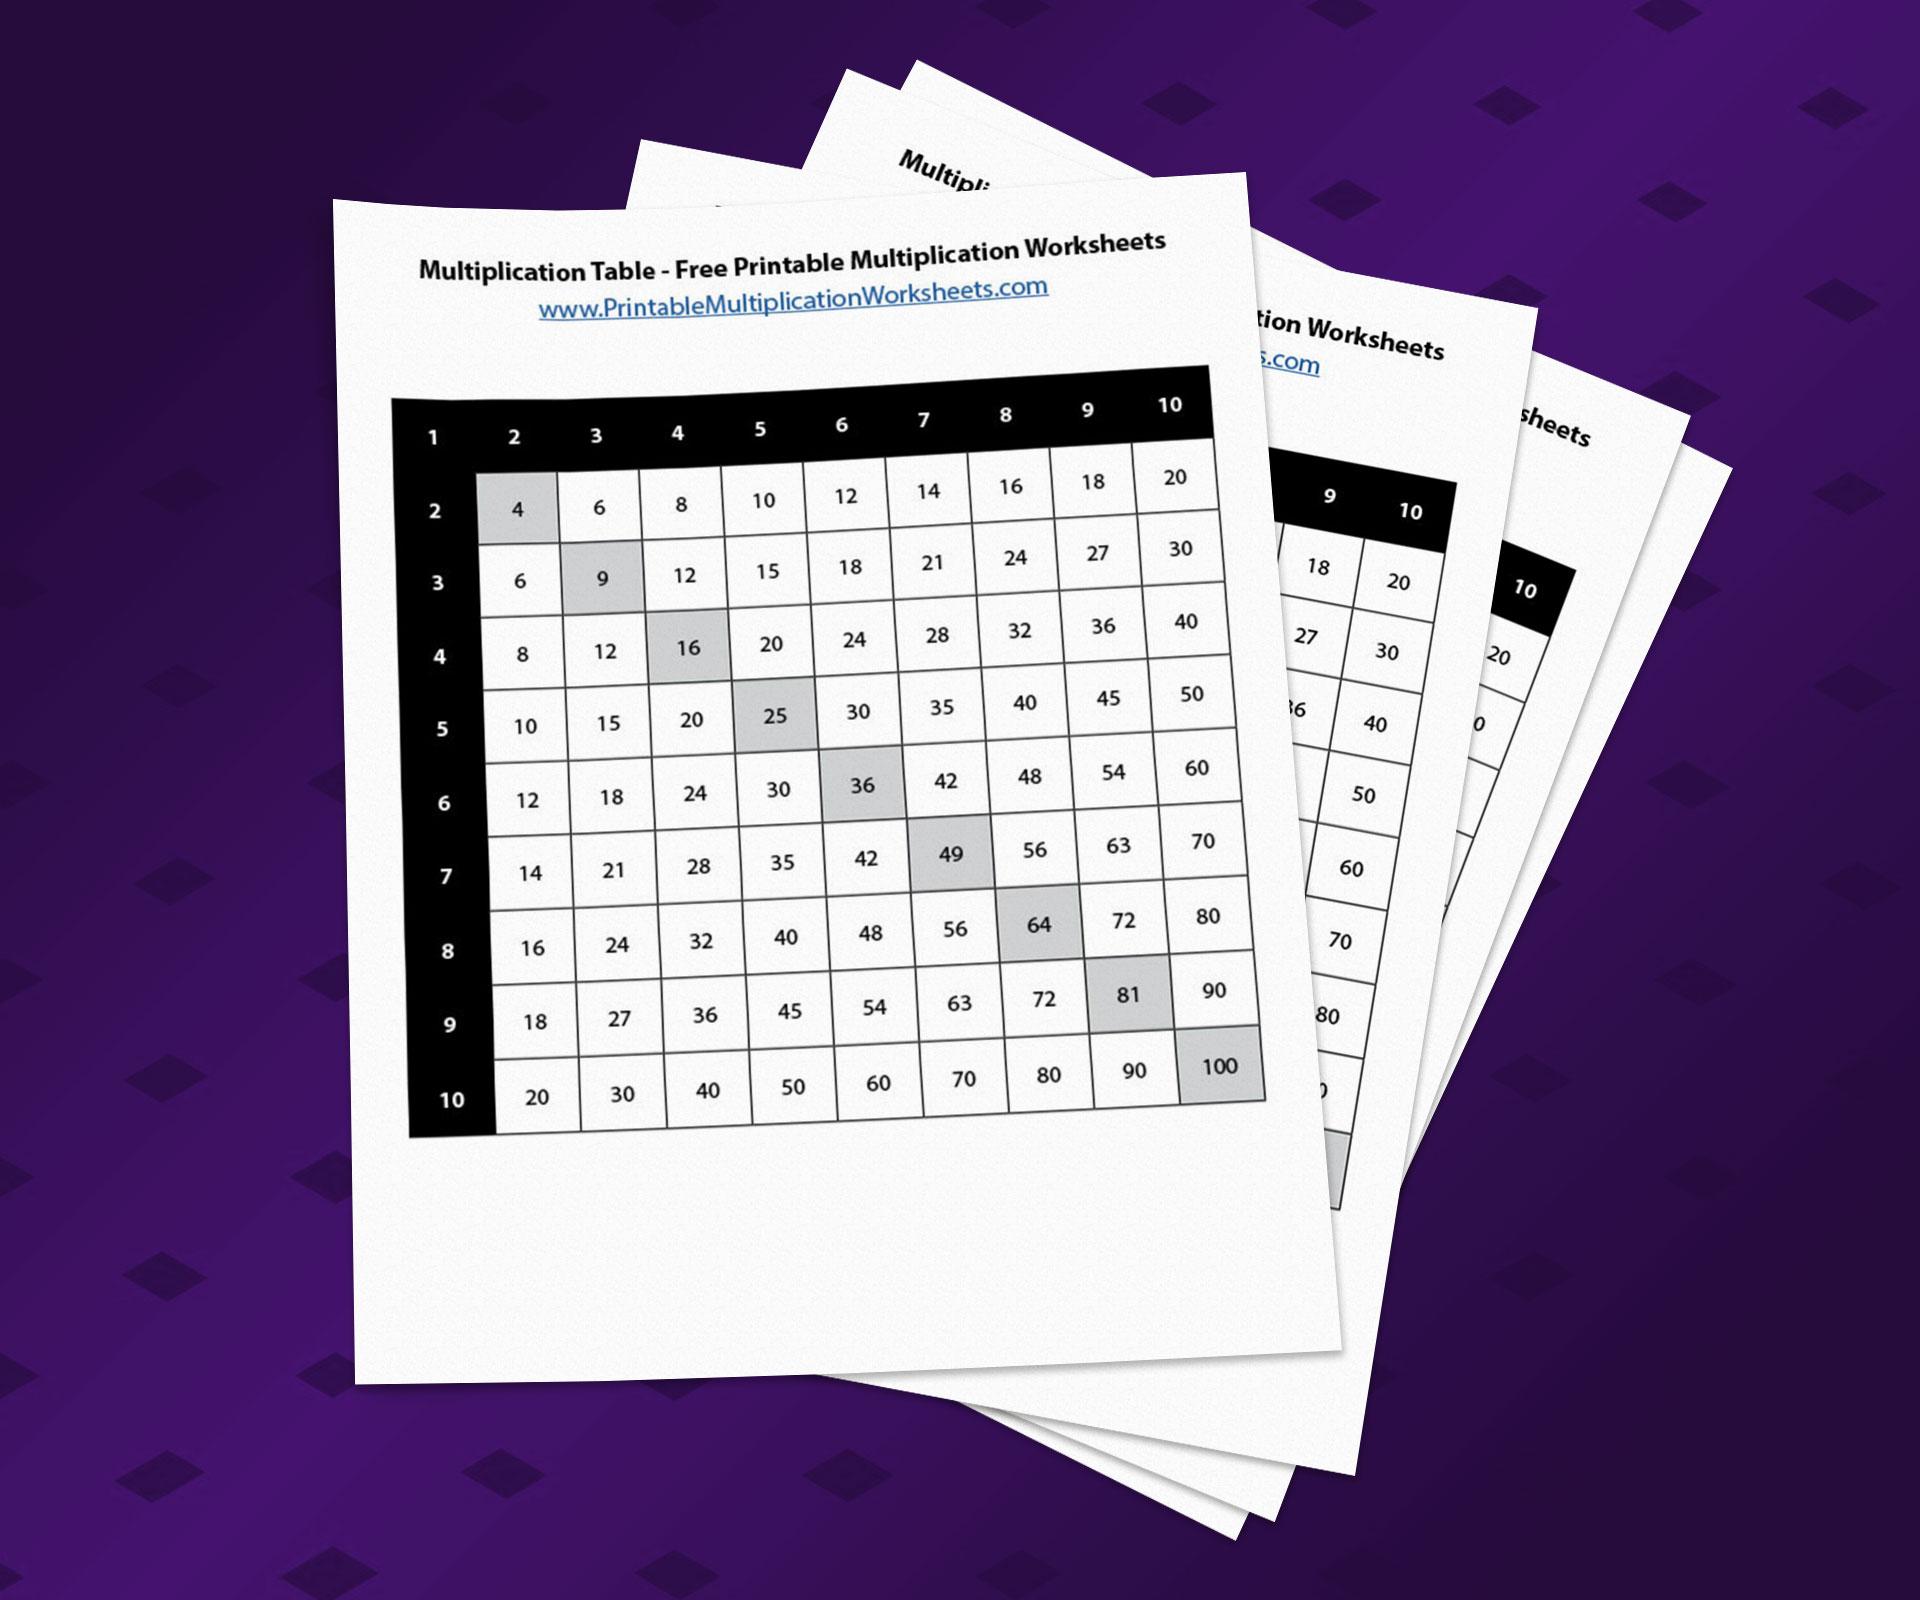 Multiplication Table - Free Printable Multiplication Worksheets PDF